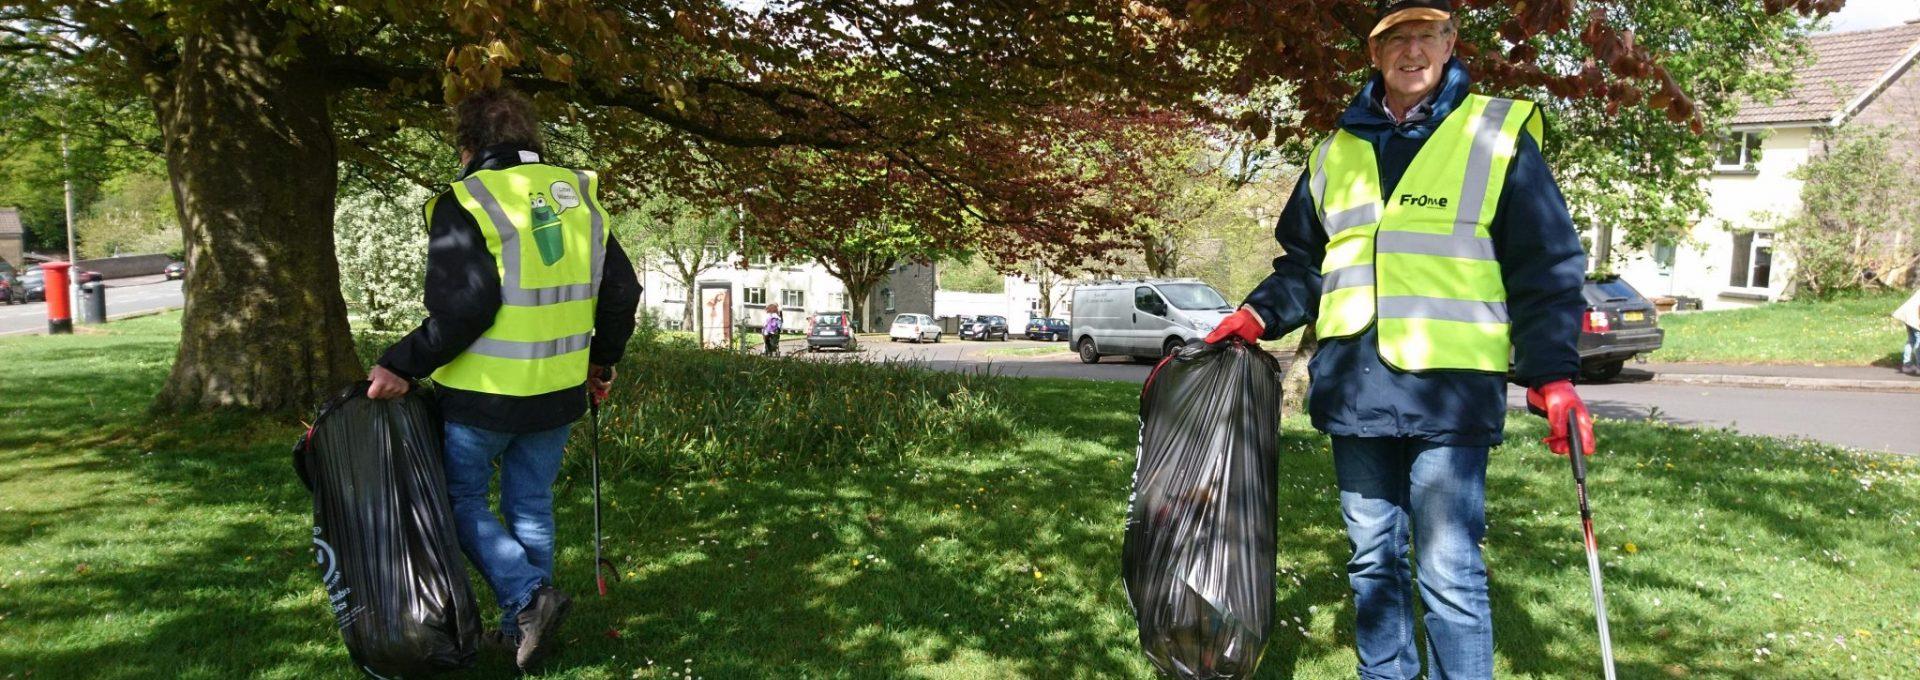 Man carrying bin bag and litter picker